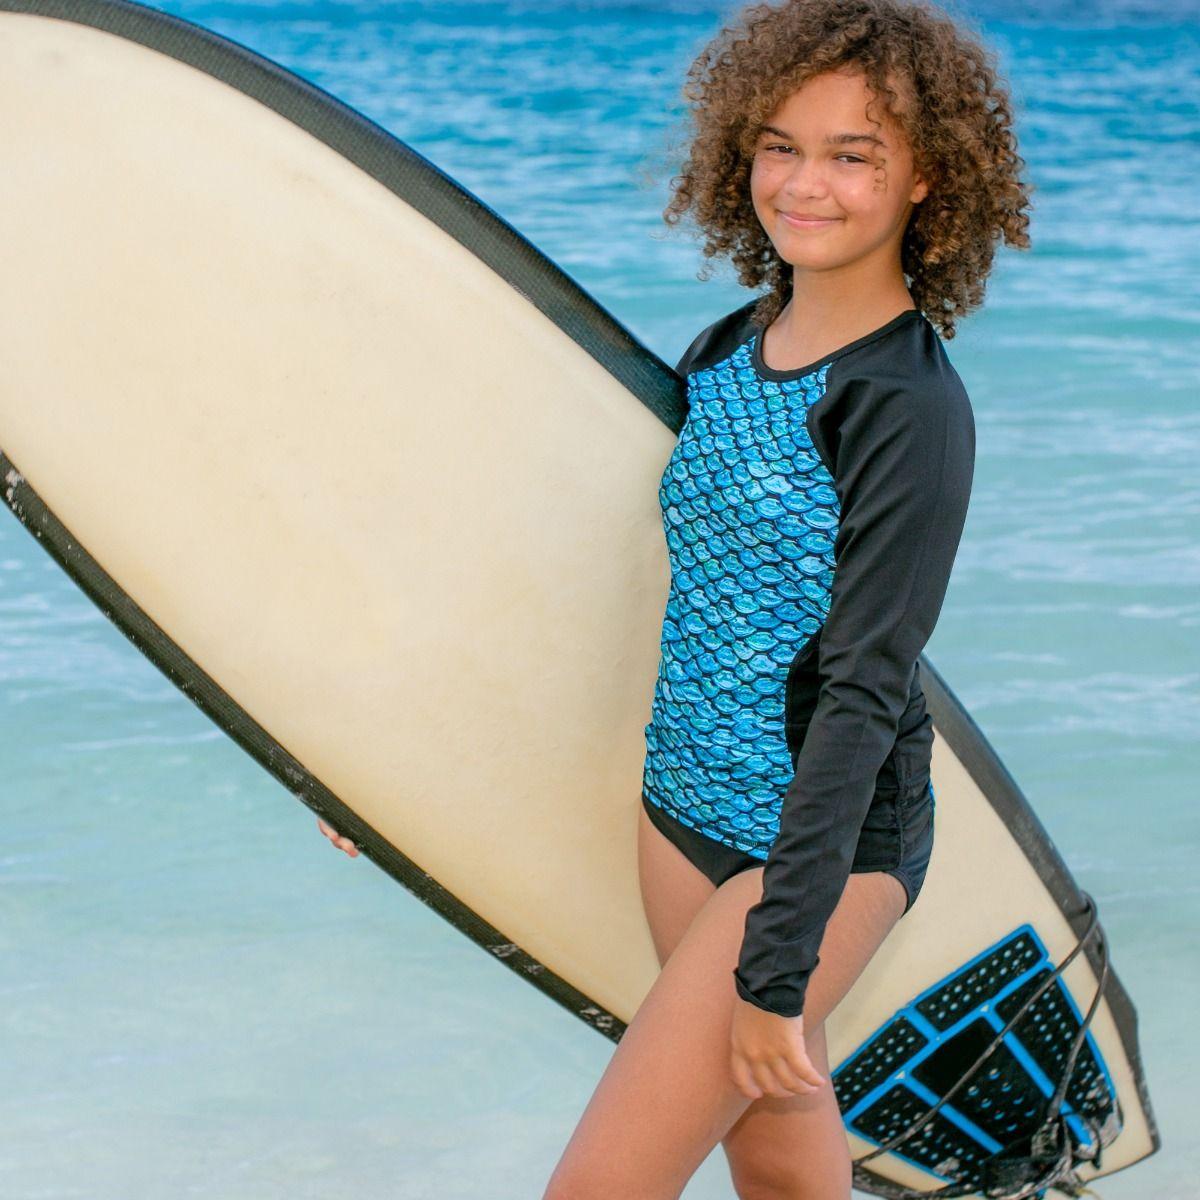 015a6e83d20 Girls Long Sleeve Swim Shirt   Tidal Teal Mermaid Rash Guard by Fin Fun